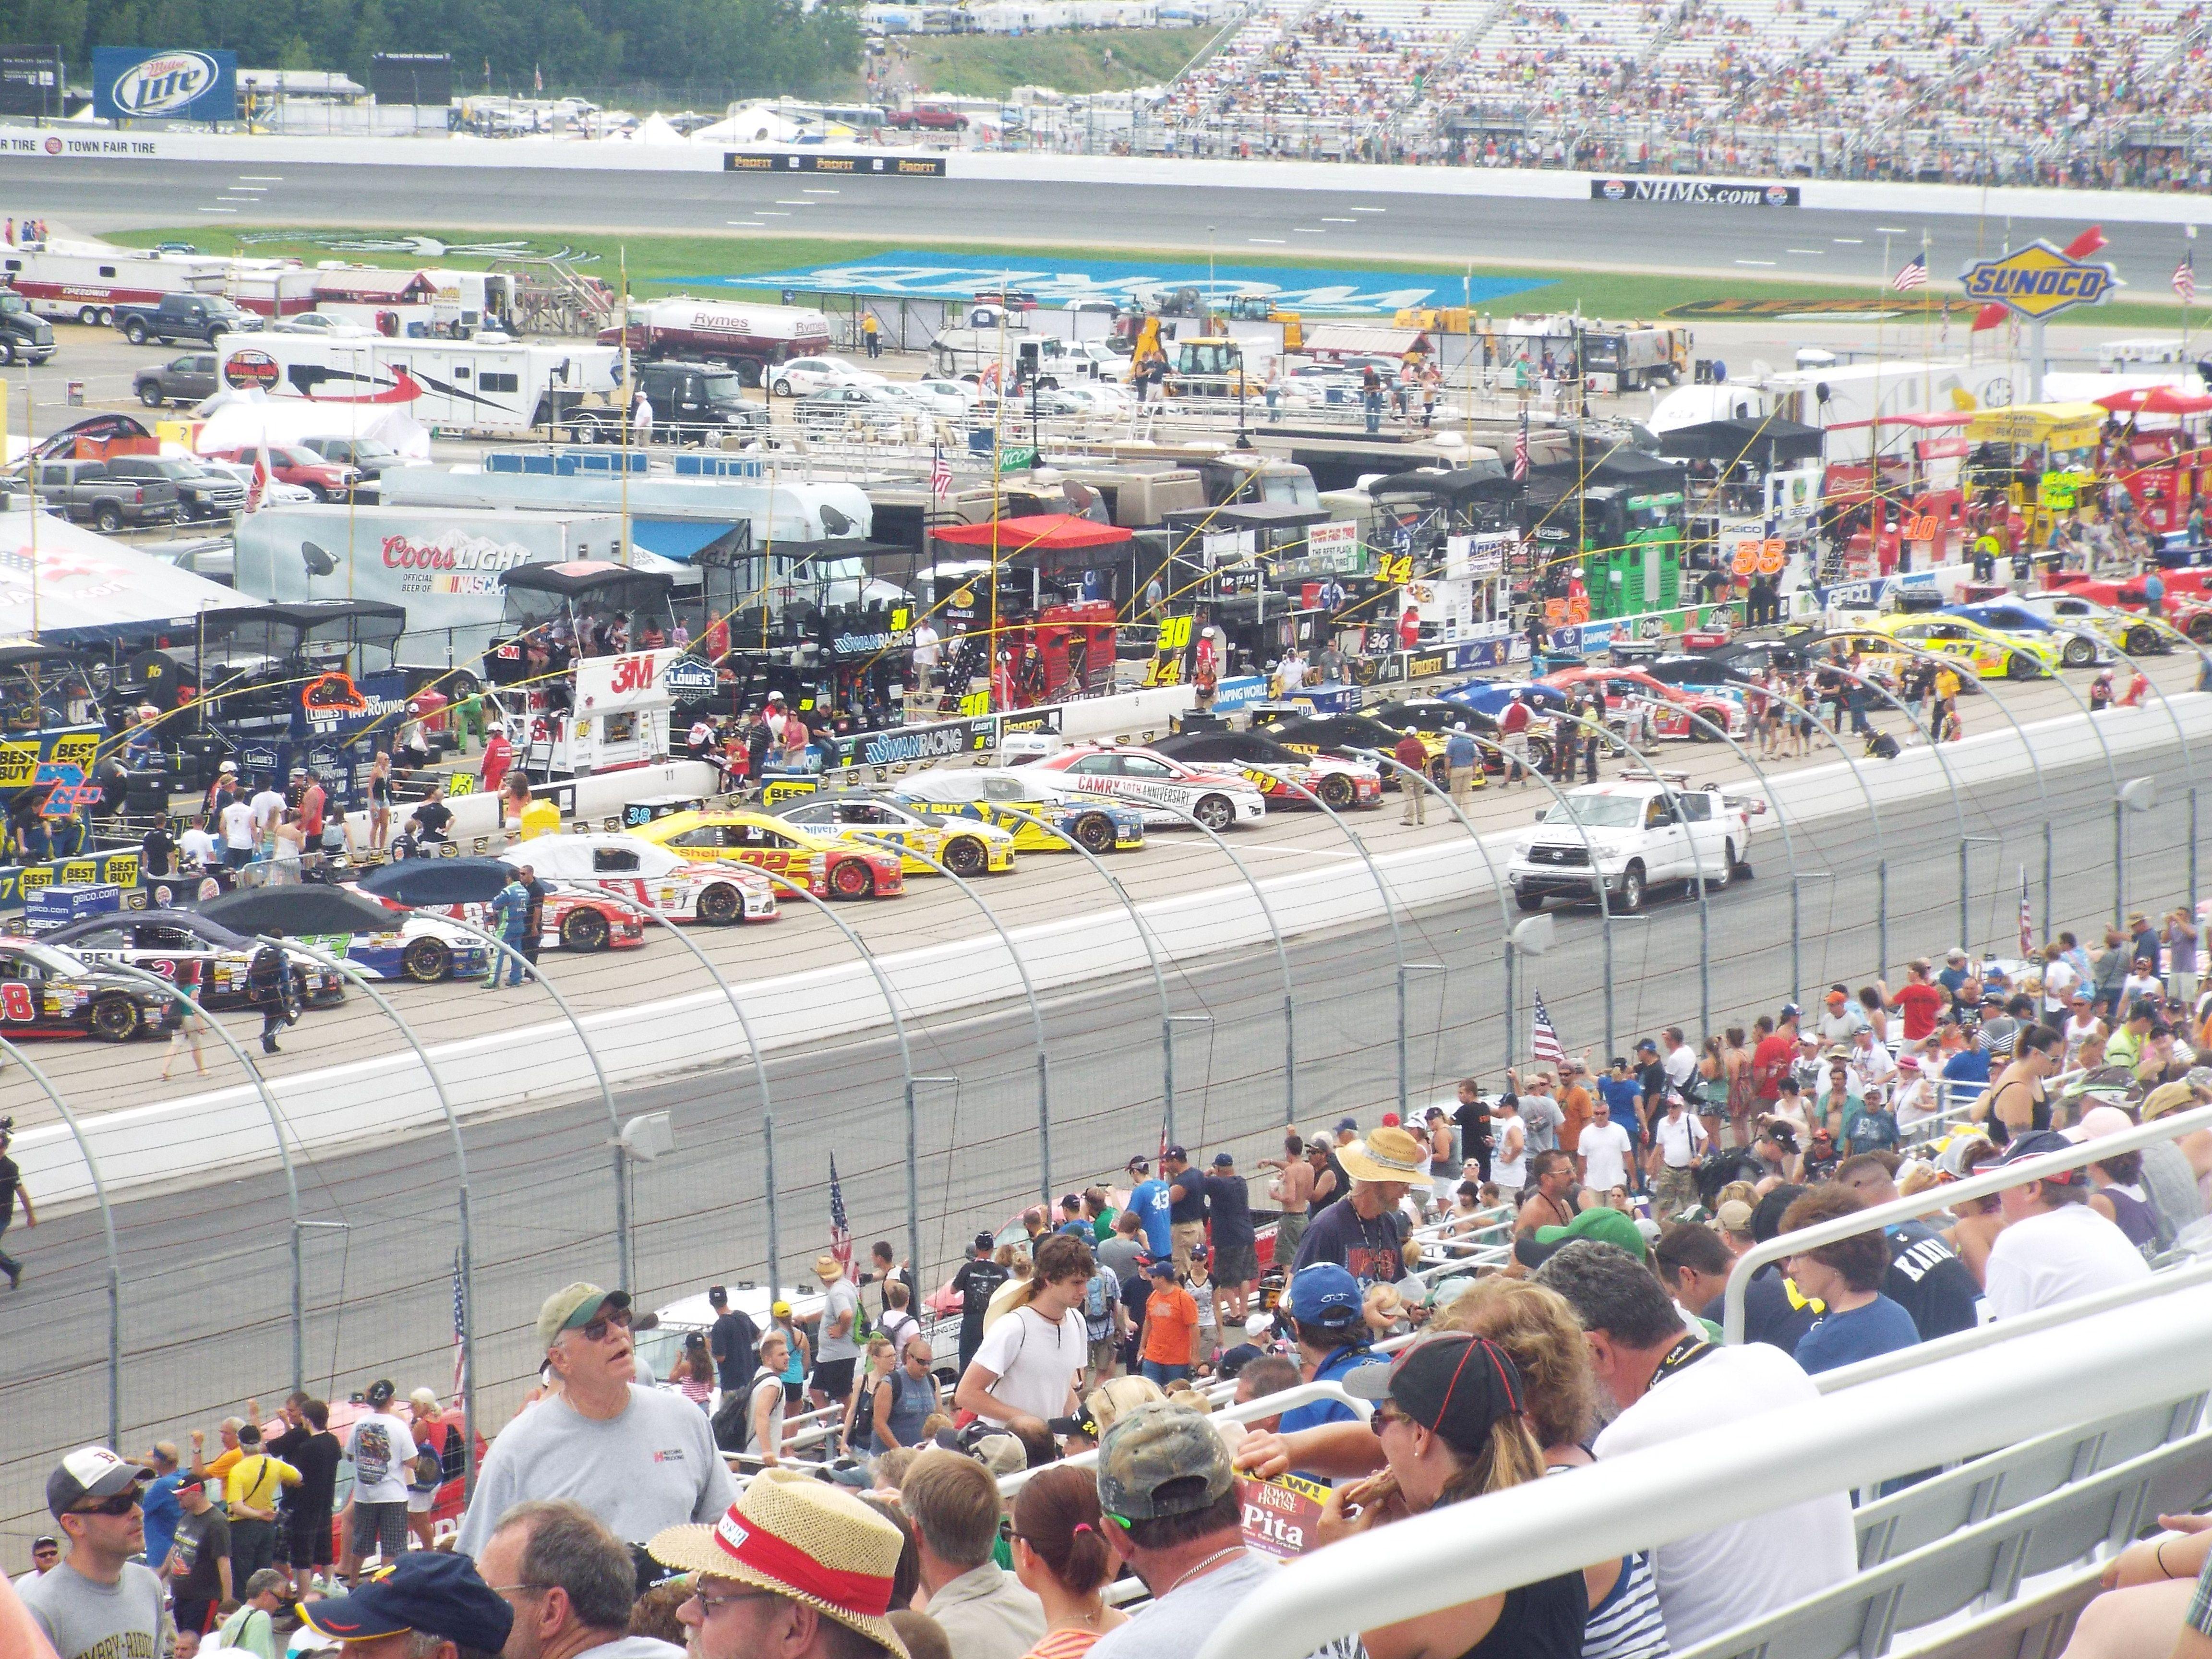 New Hampshire Motor Speedway 2013